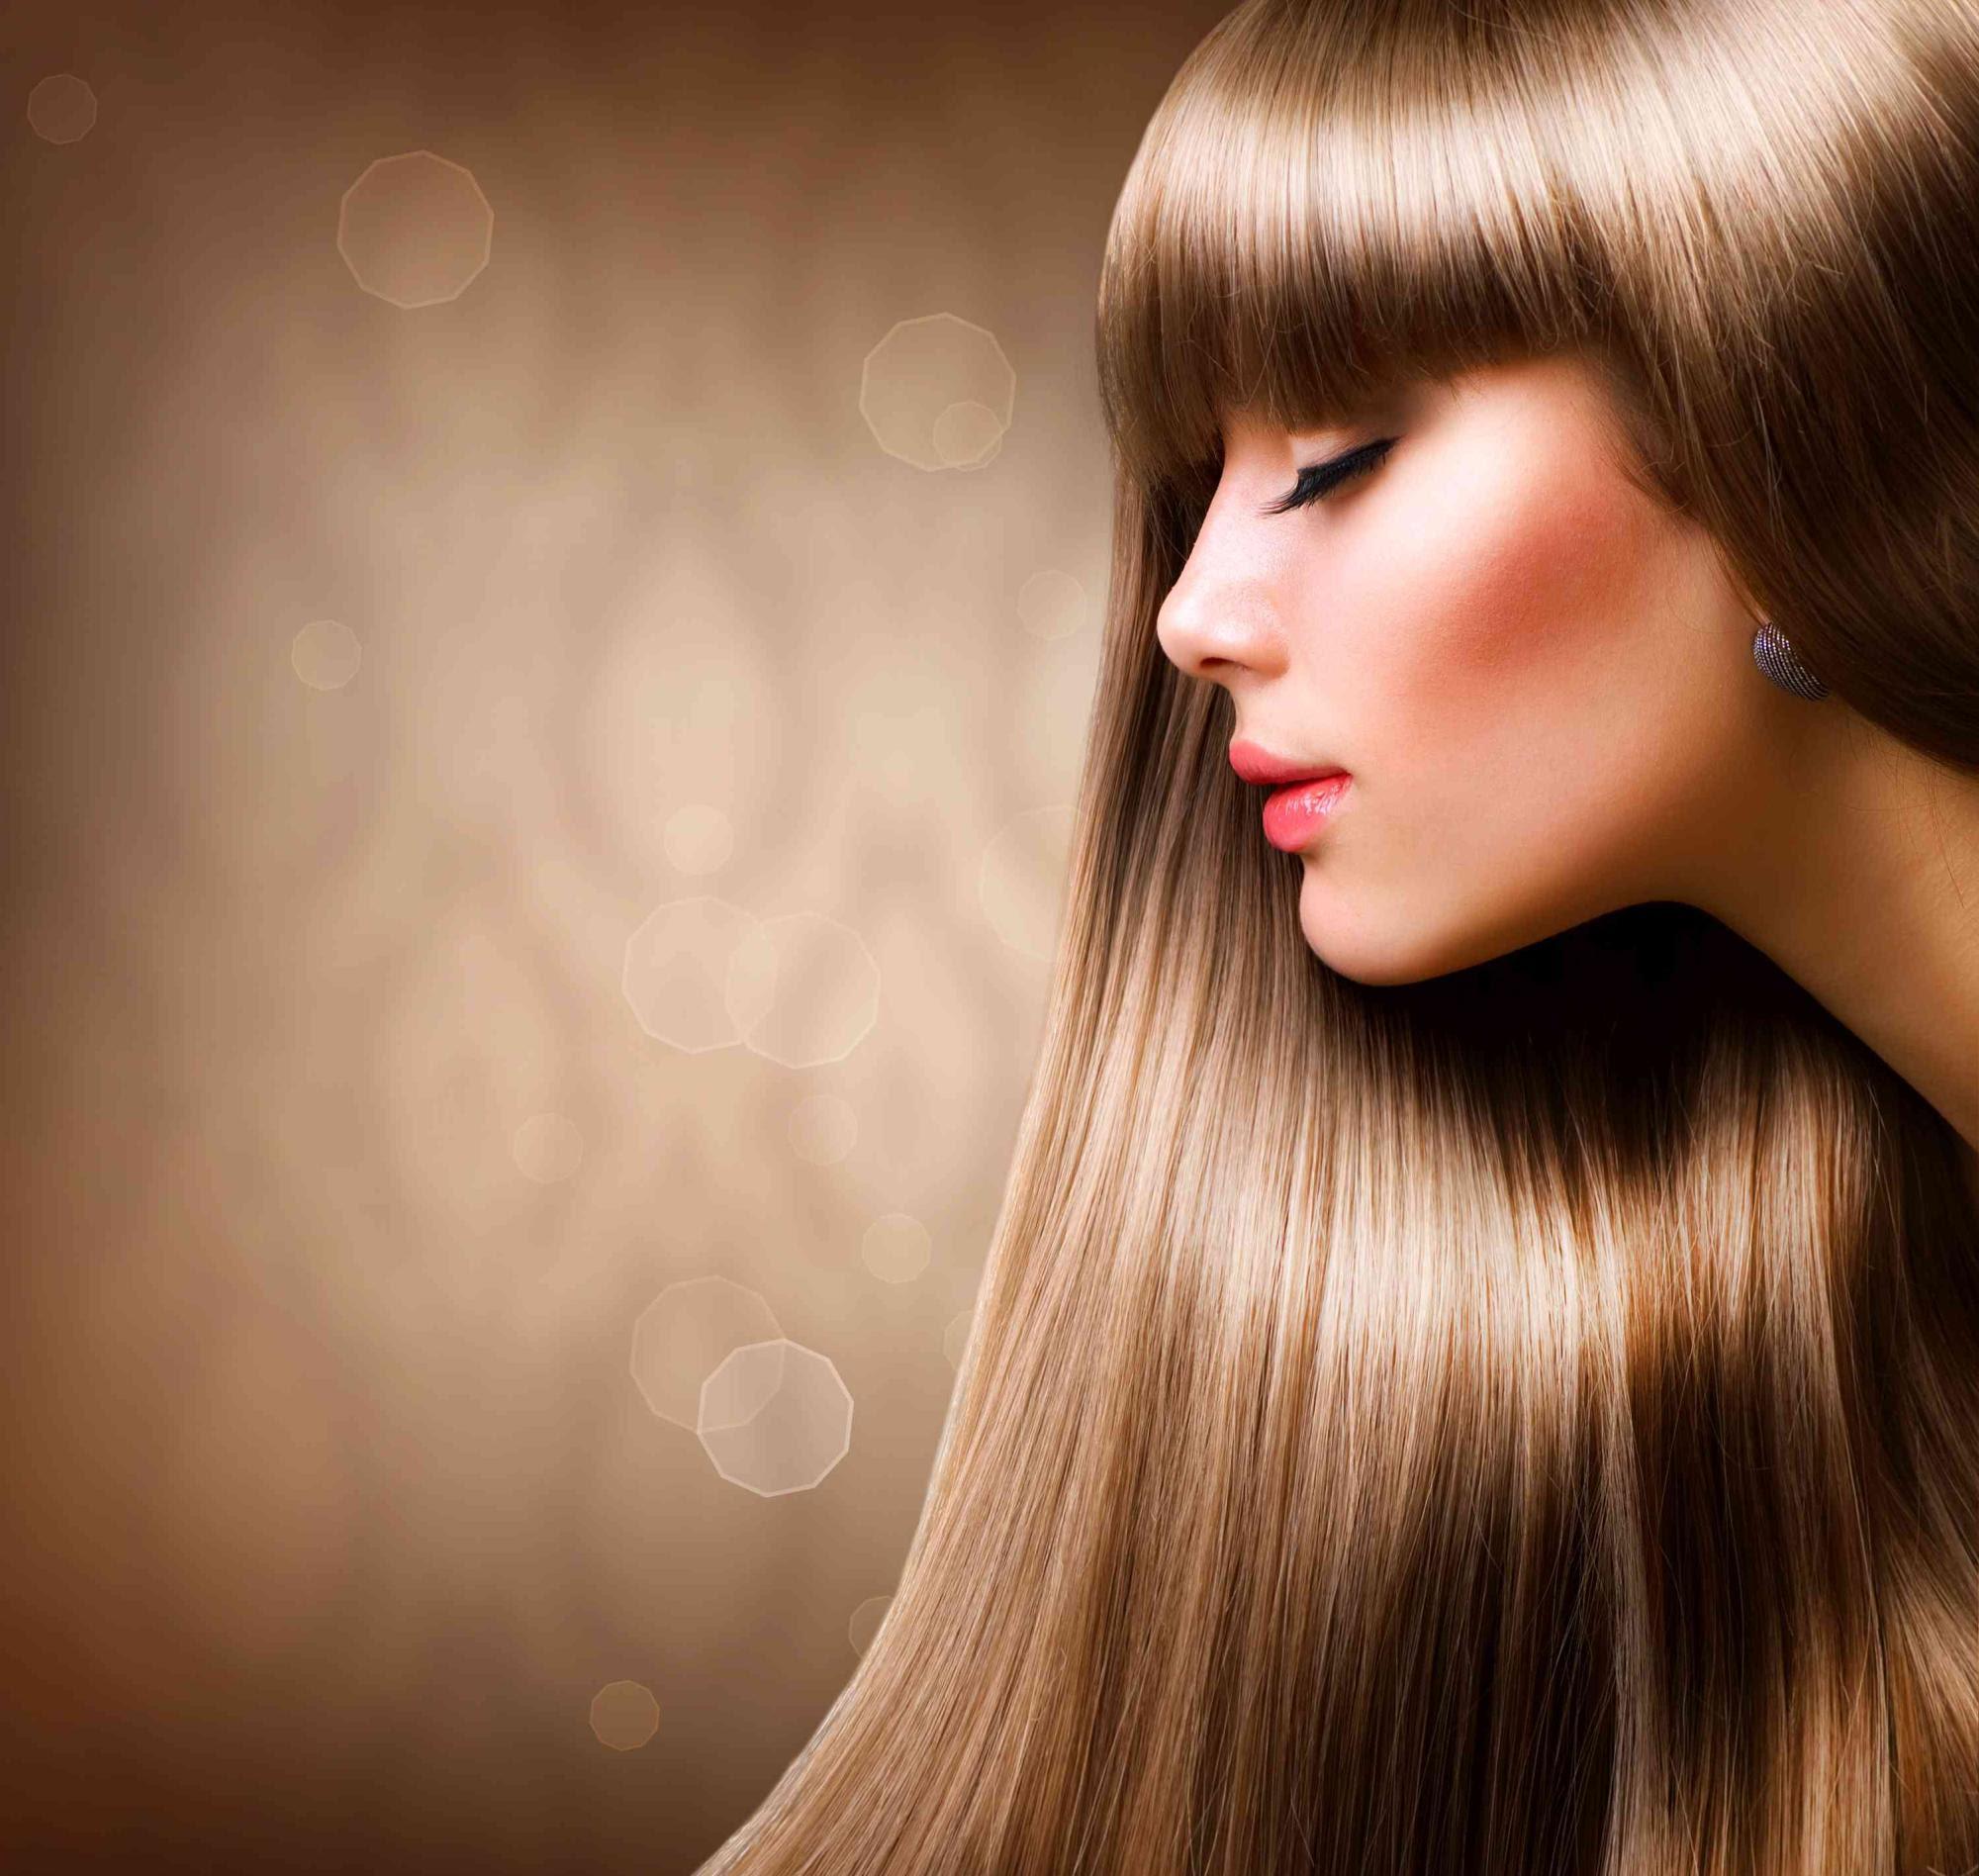 Hair Salon Beauty Waxing And Salon Atlanta Ga